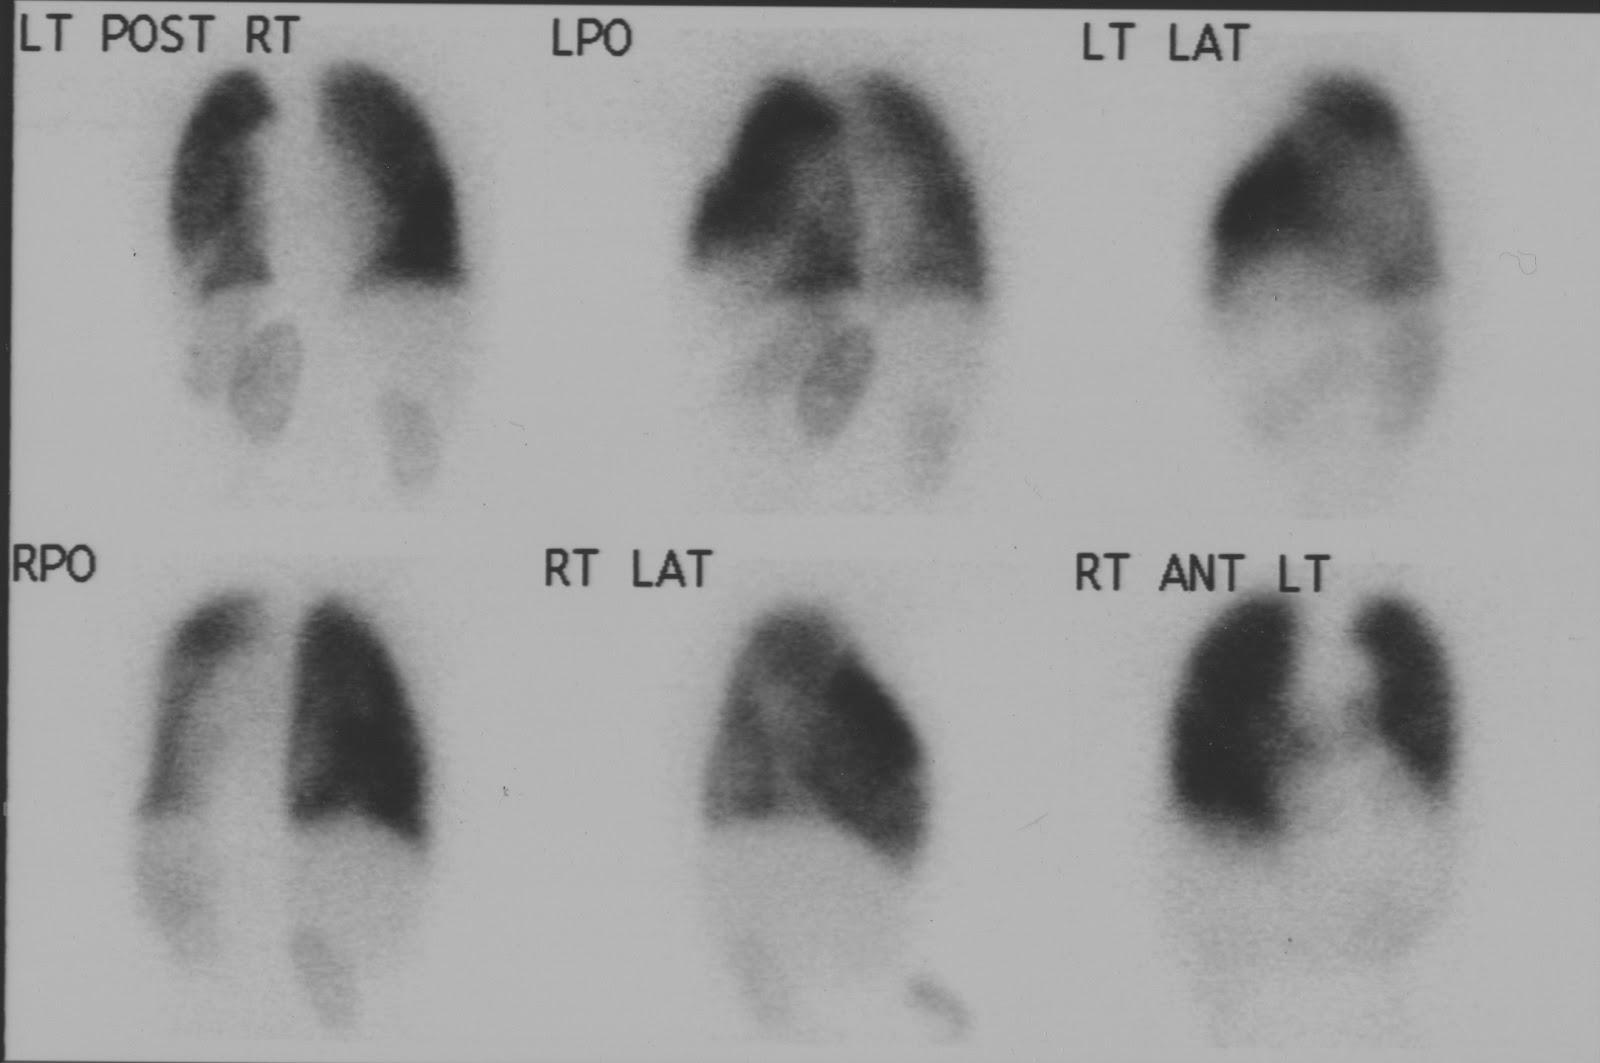 Nuclear Medicine Technology Program: Lung Scan - renal uptake